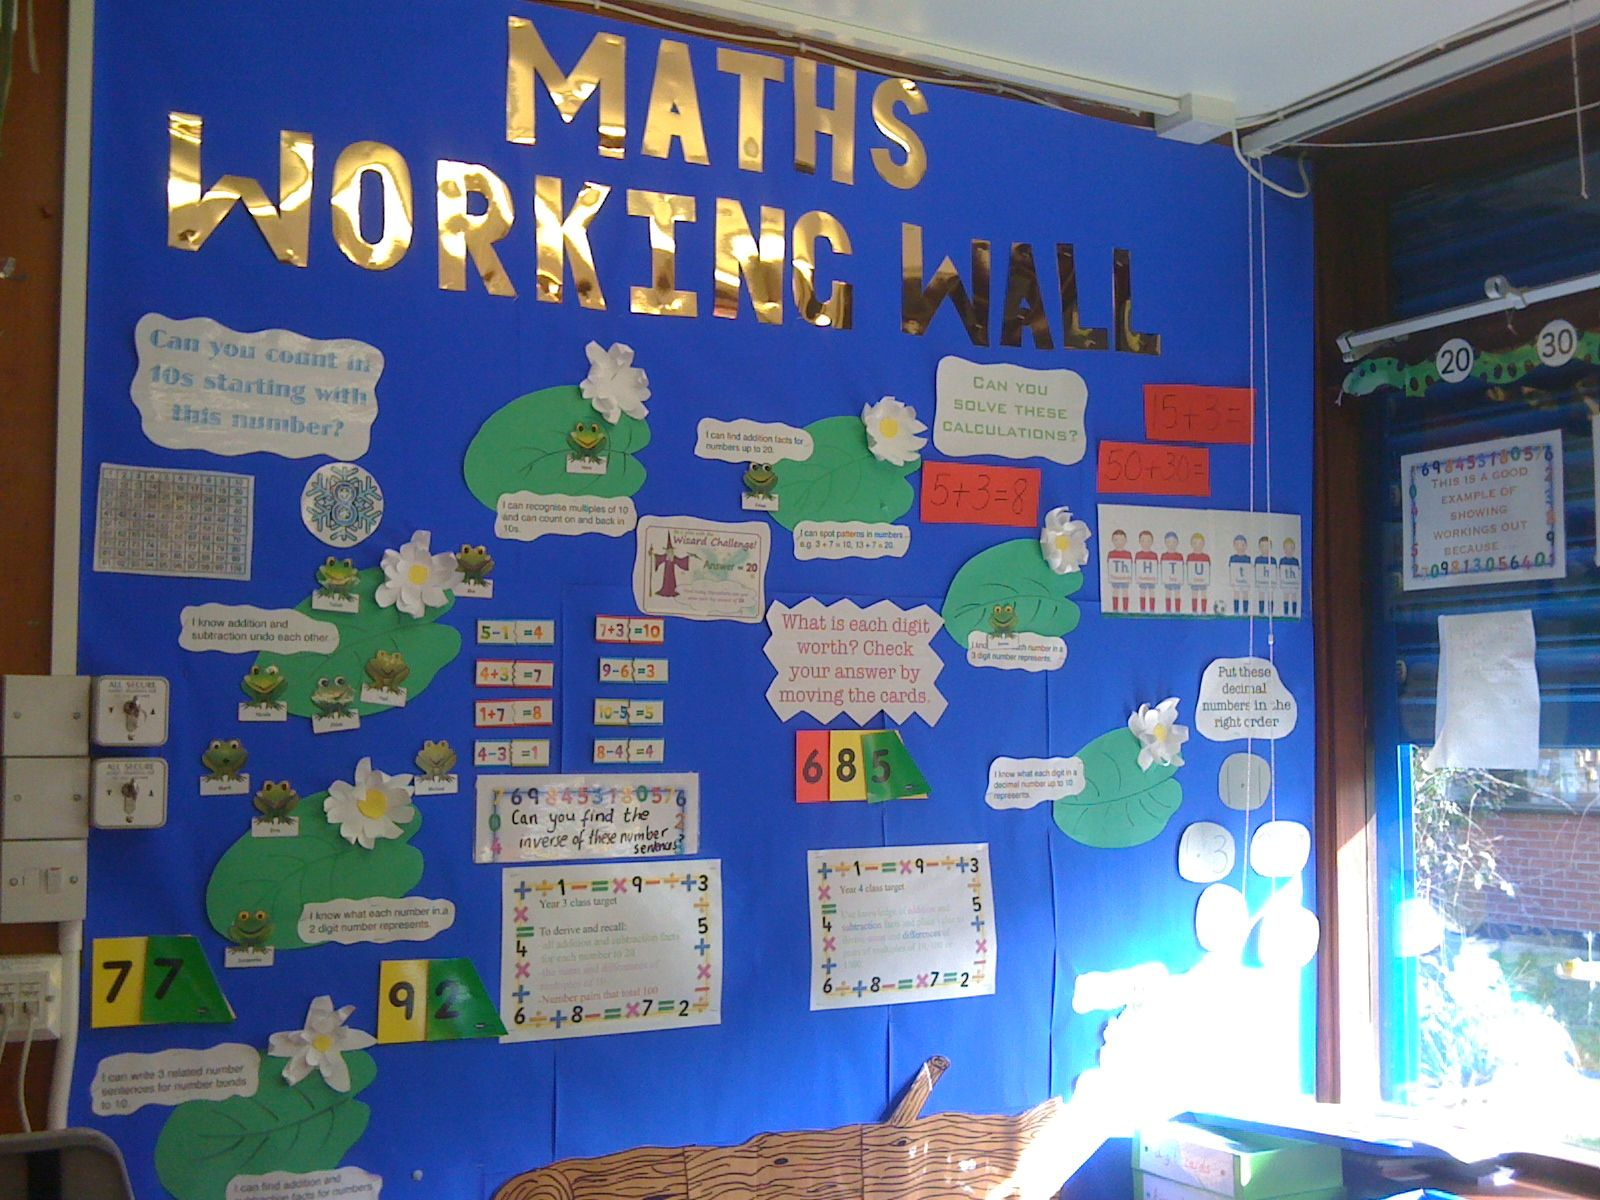 Maths working wall | Displays | Maths working wall, Working